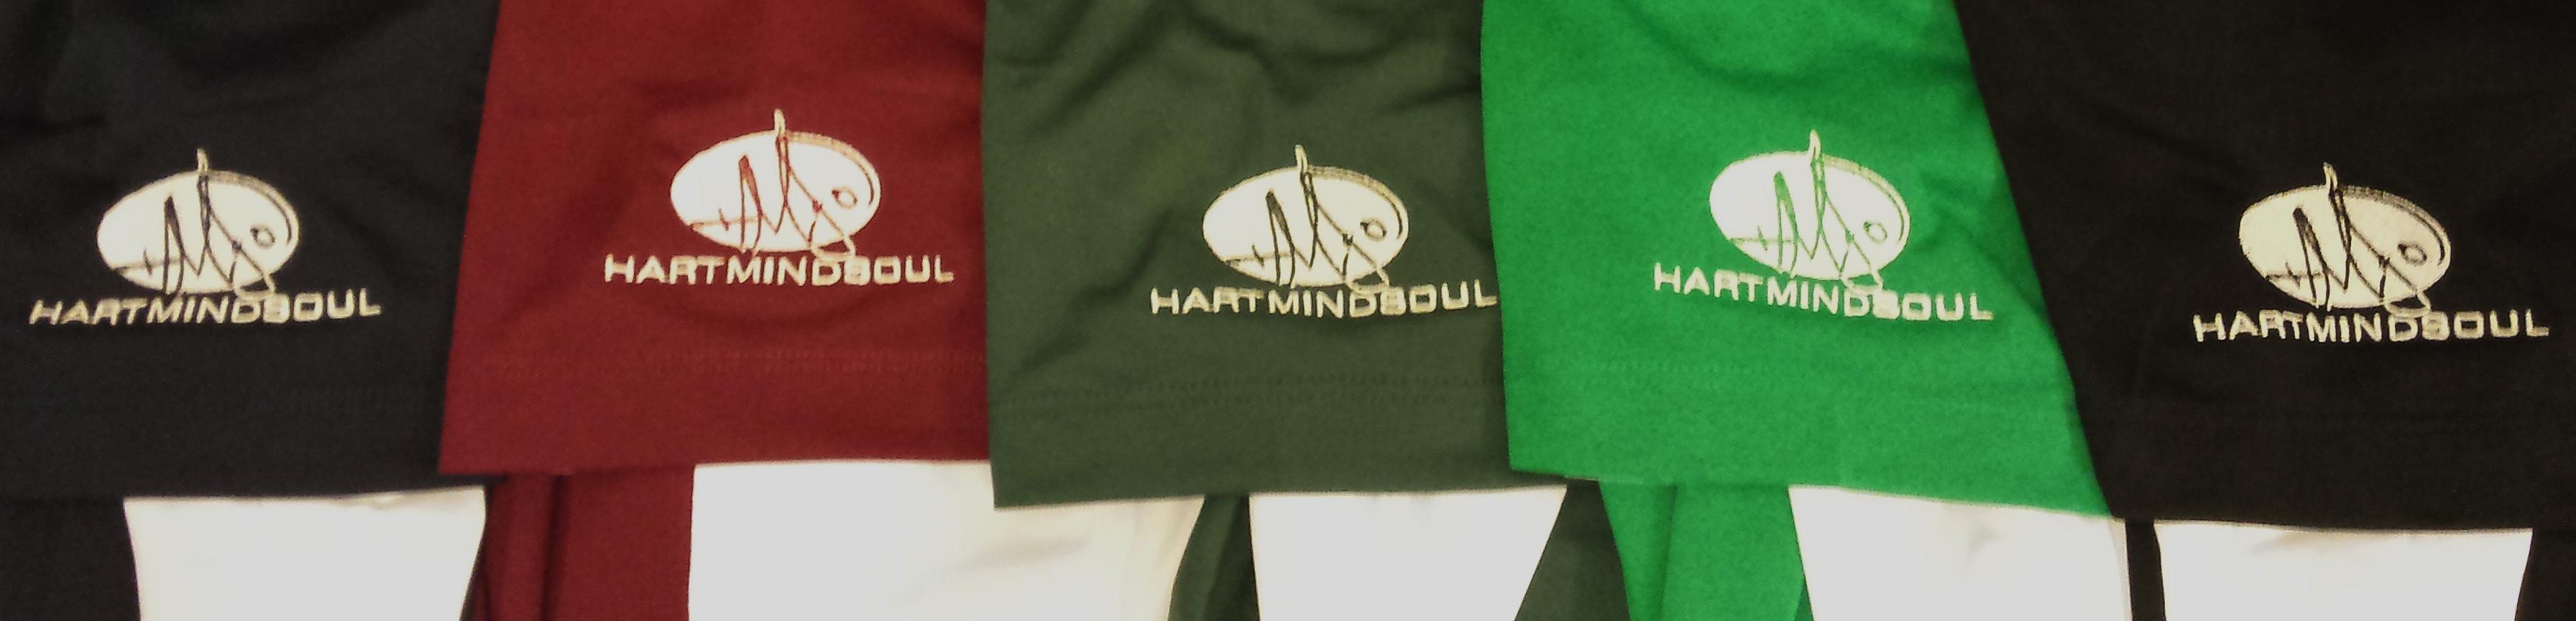 Portland HMS embroidery dryfit polo shirts